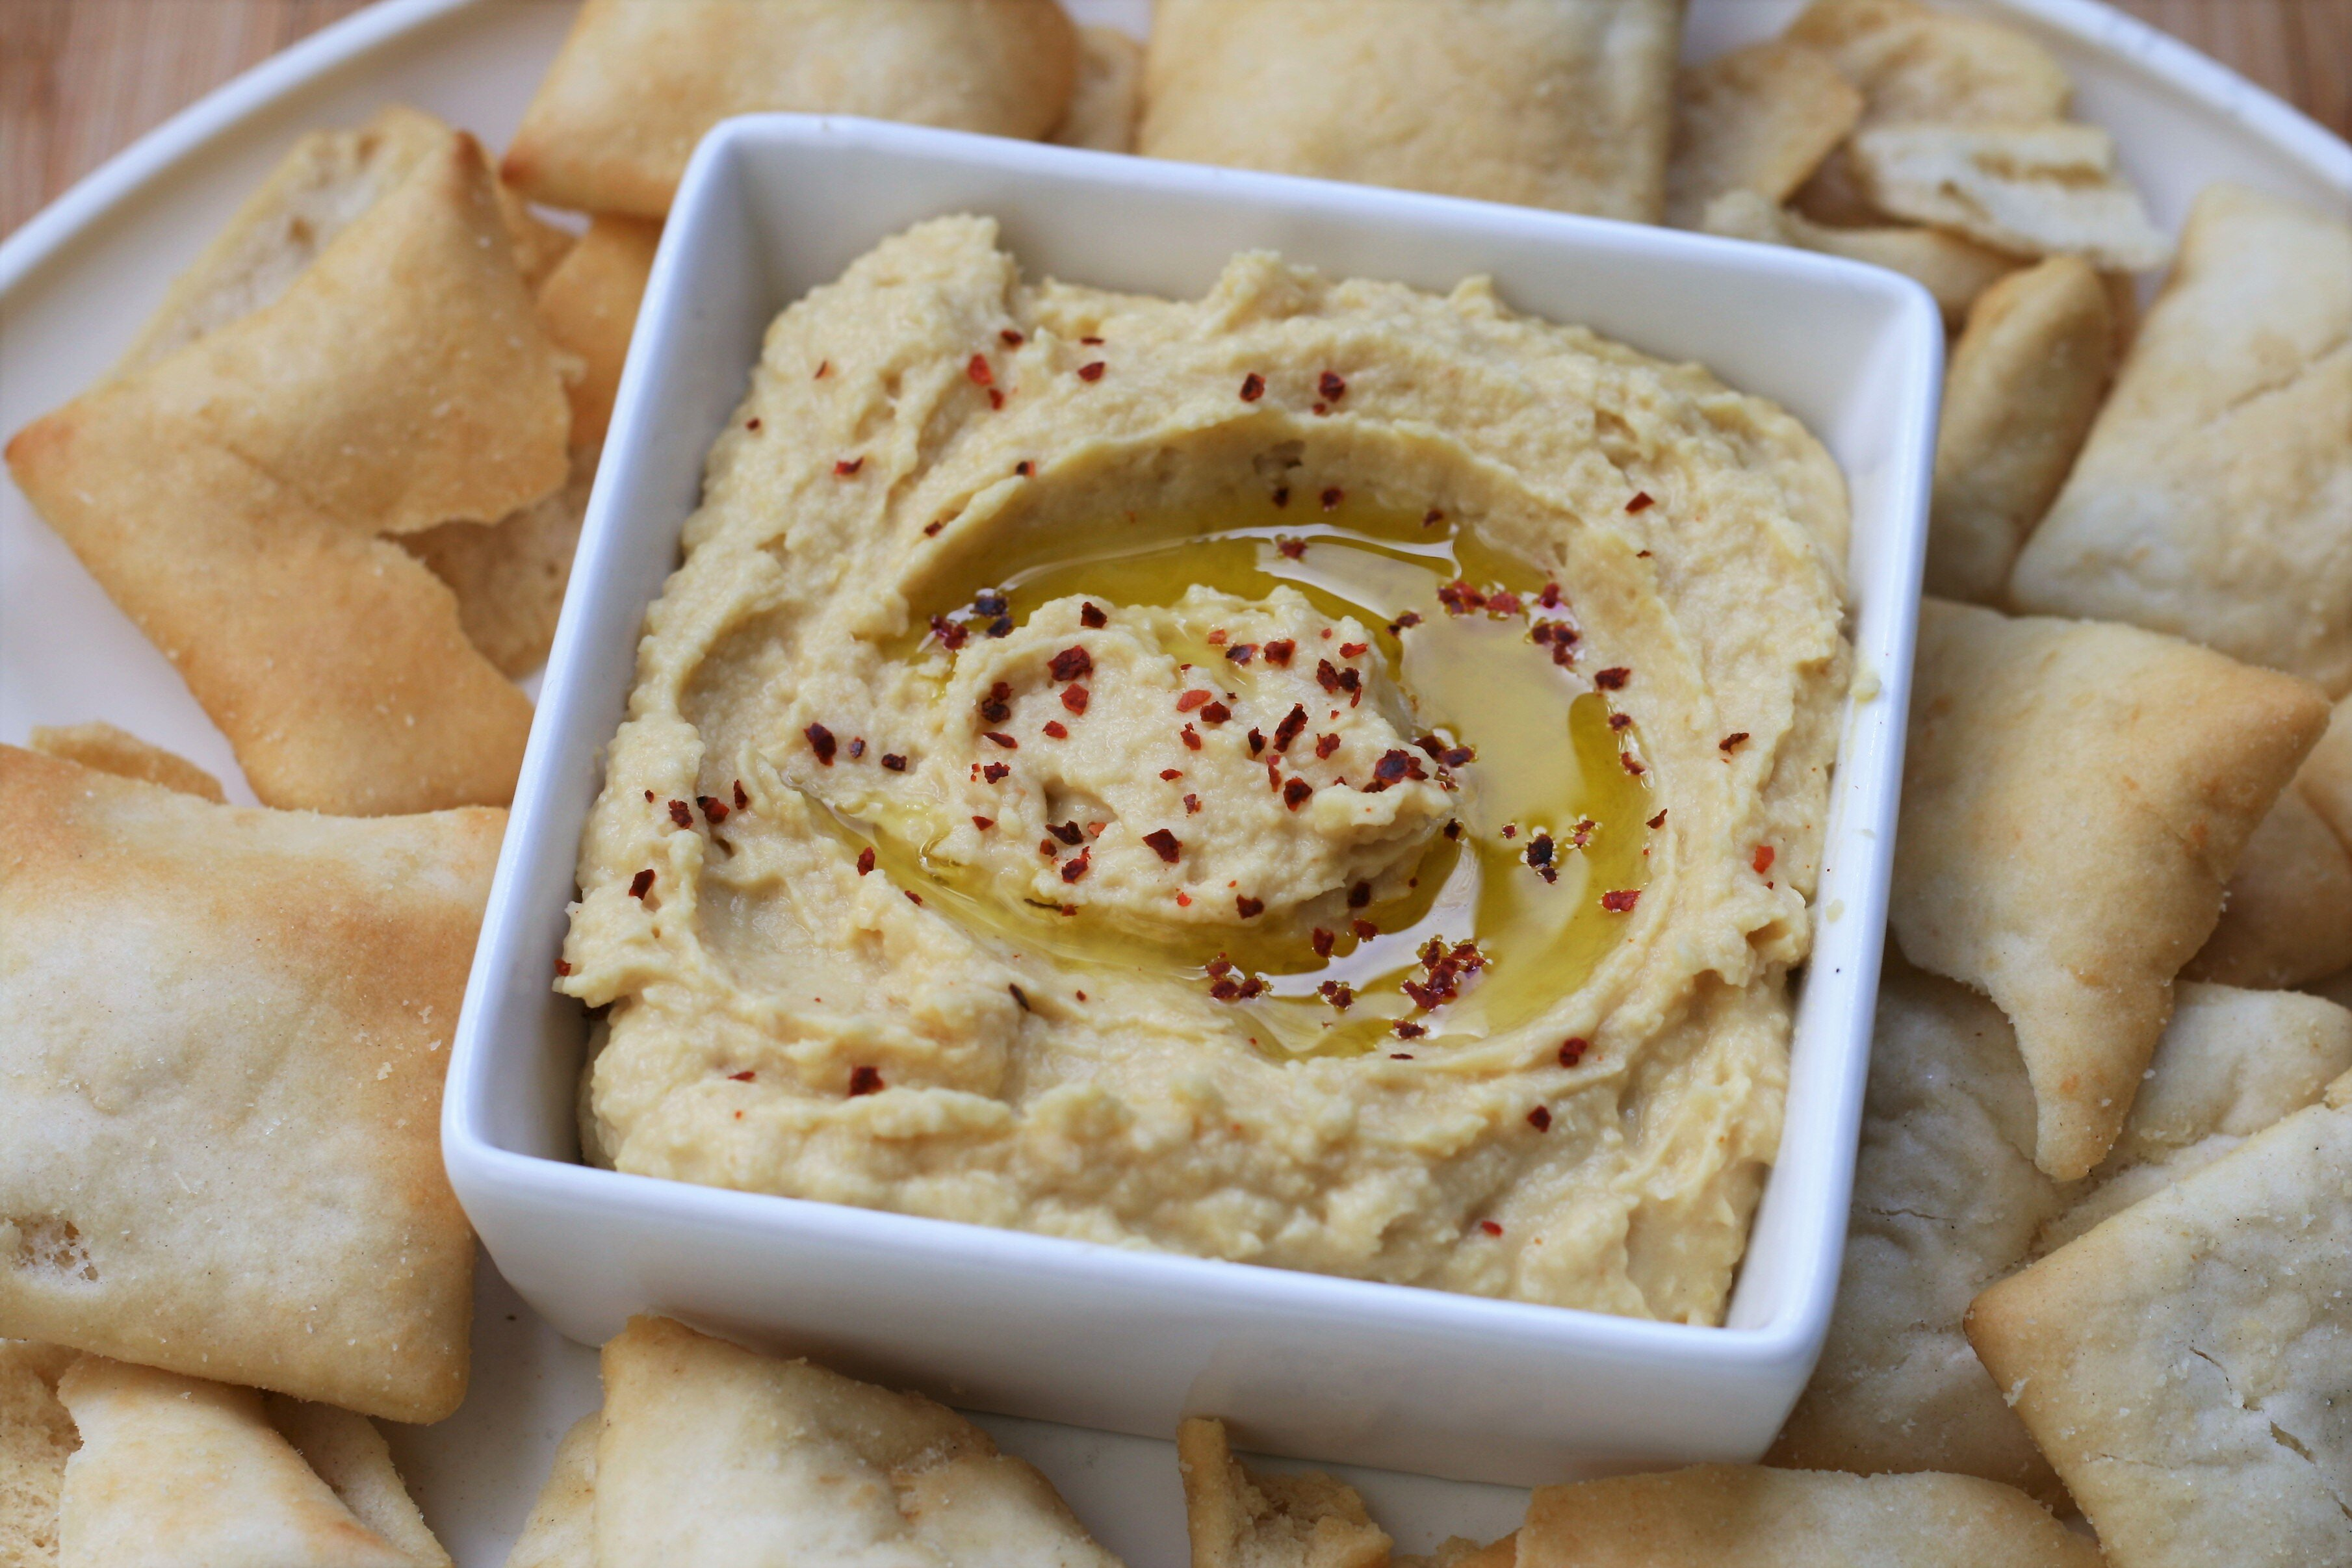 tahiniless hummus recipe